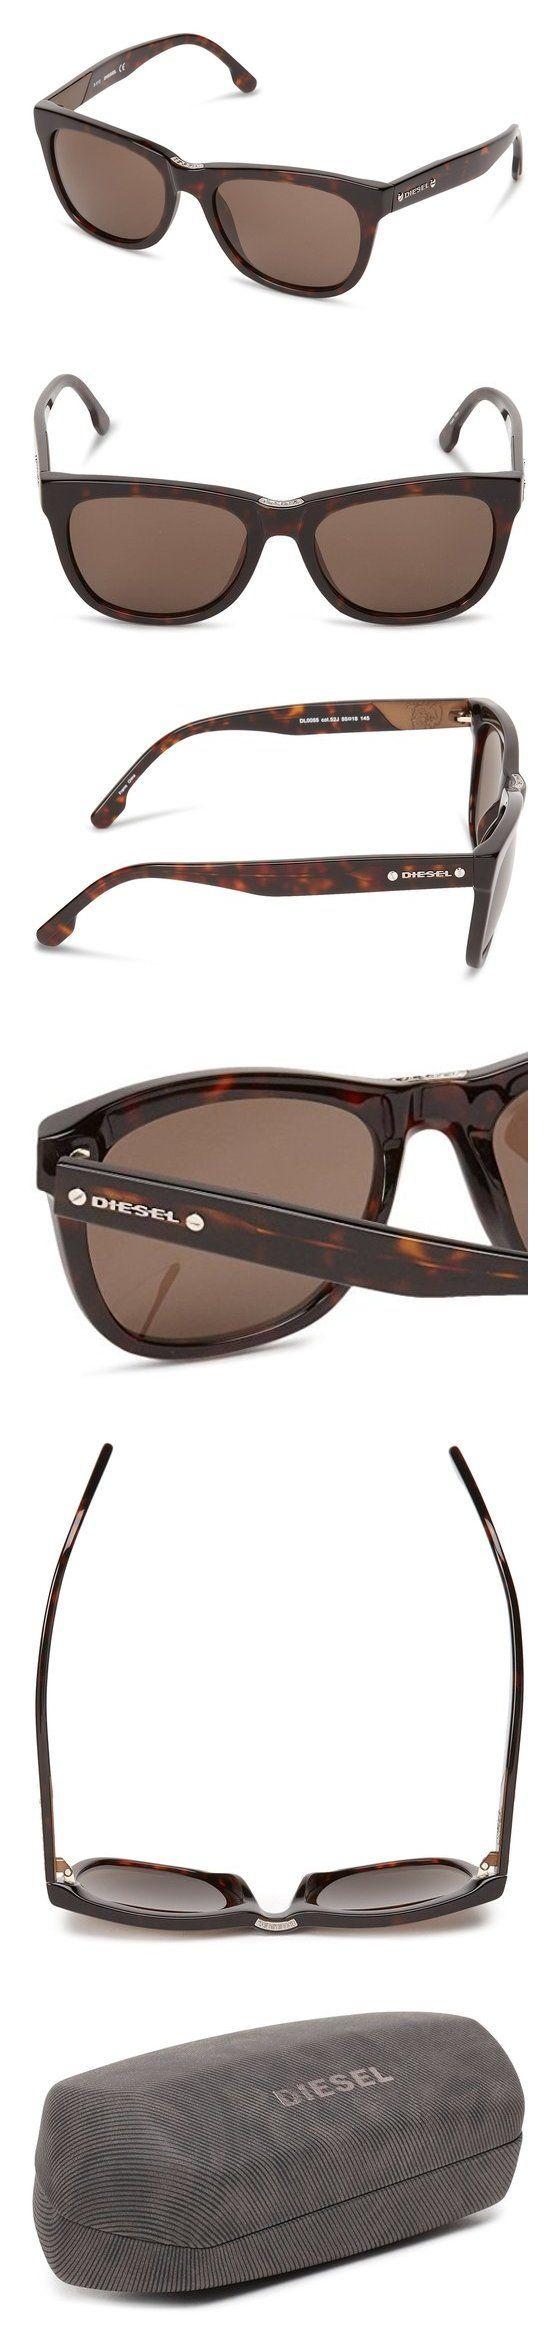 $180 - Diesel Dl00555552J Wayfarer Sunglasses #sunglasses #